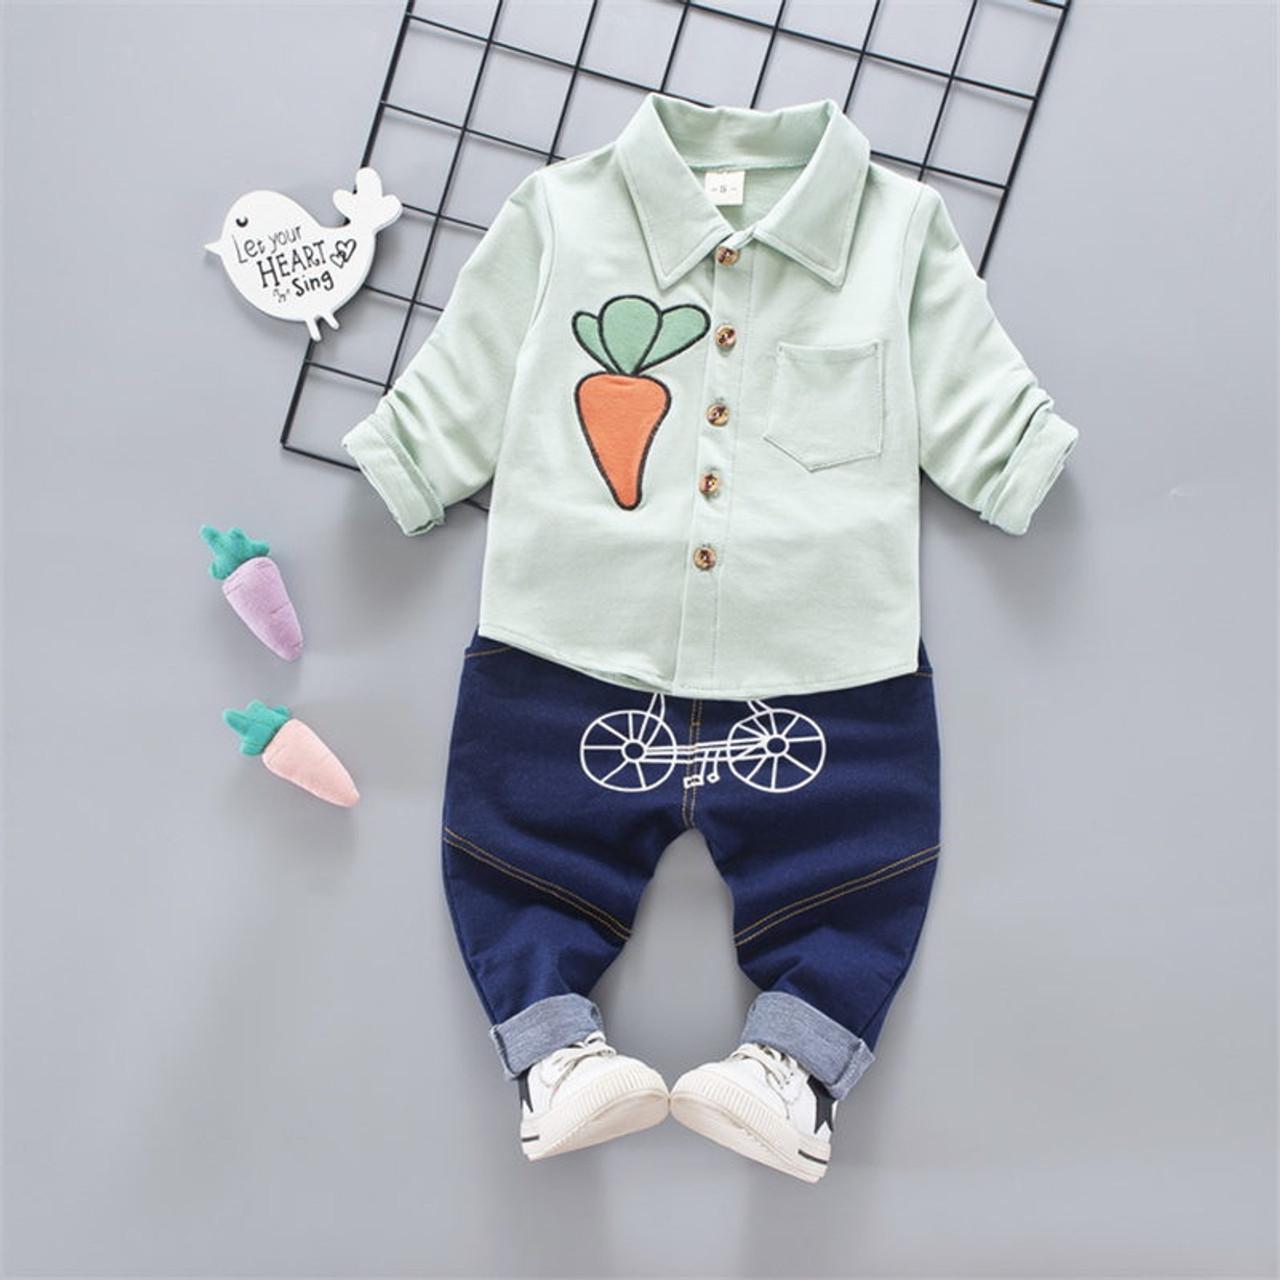 BibiCola baby boys clothing set pants + shirt children boys clothes sets  carrot pattern kids child sports suits toddler sets - OnshopDeals.Com